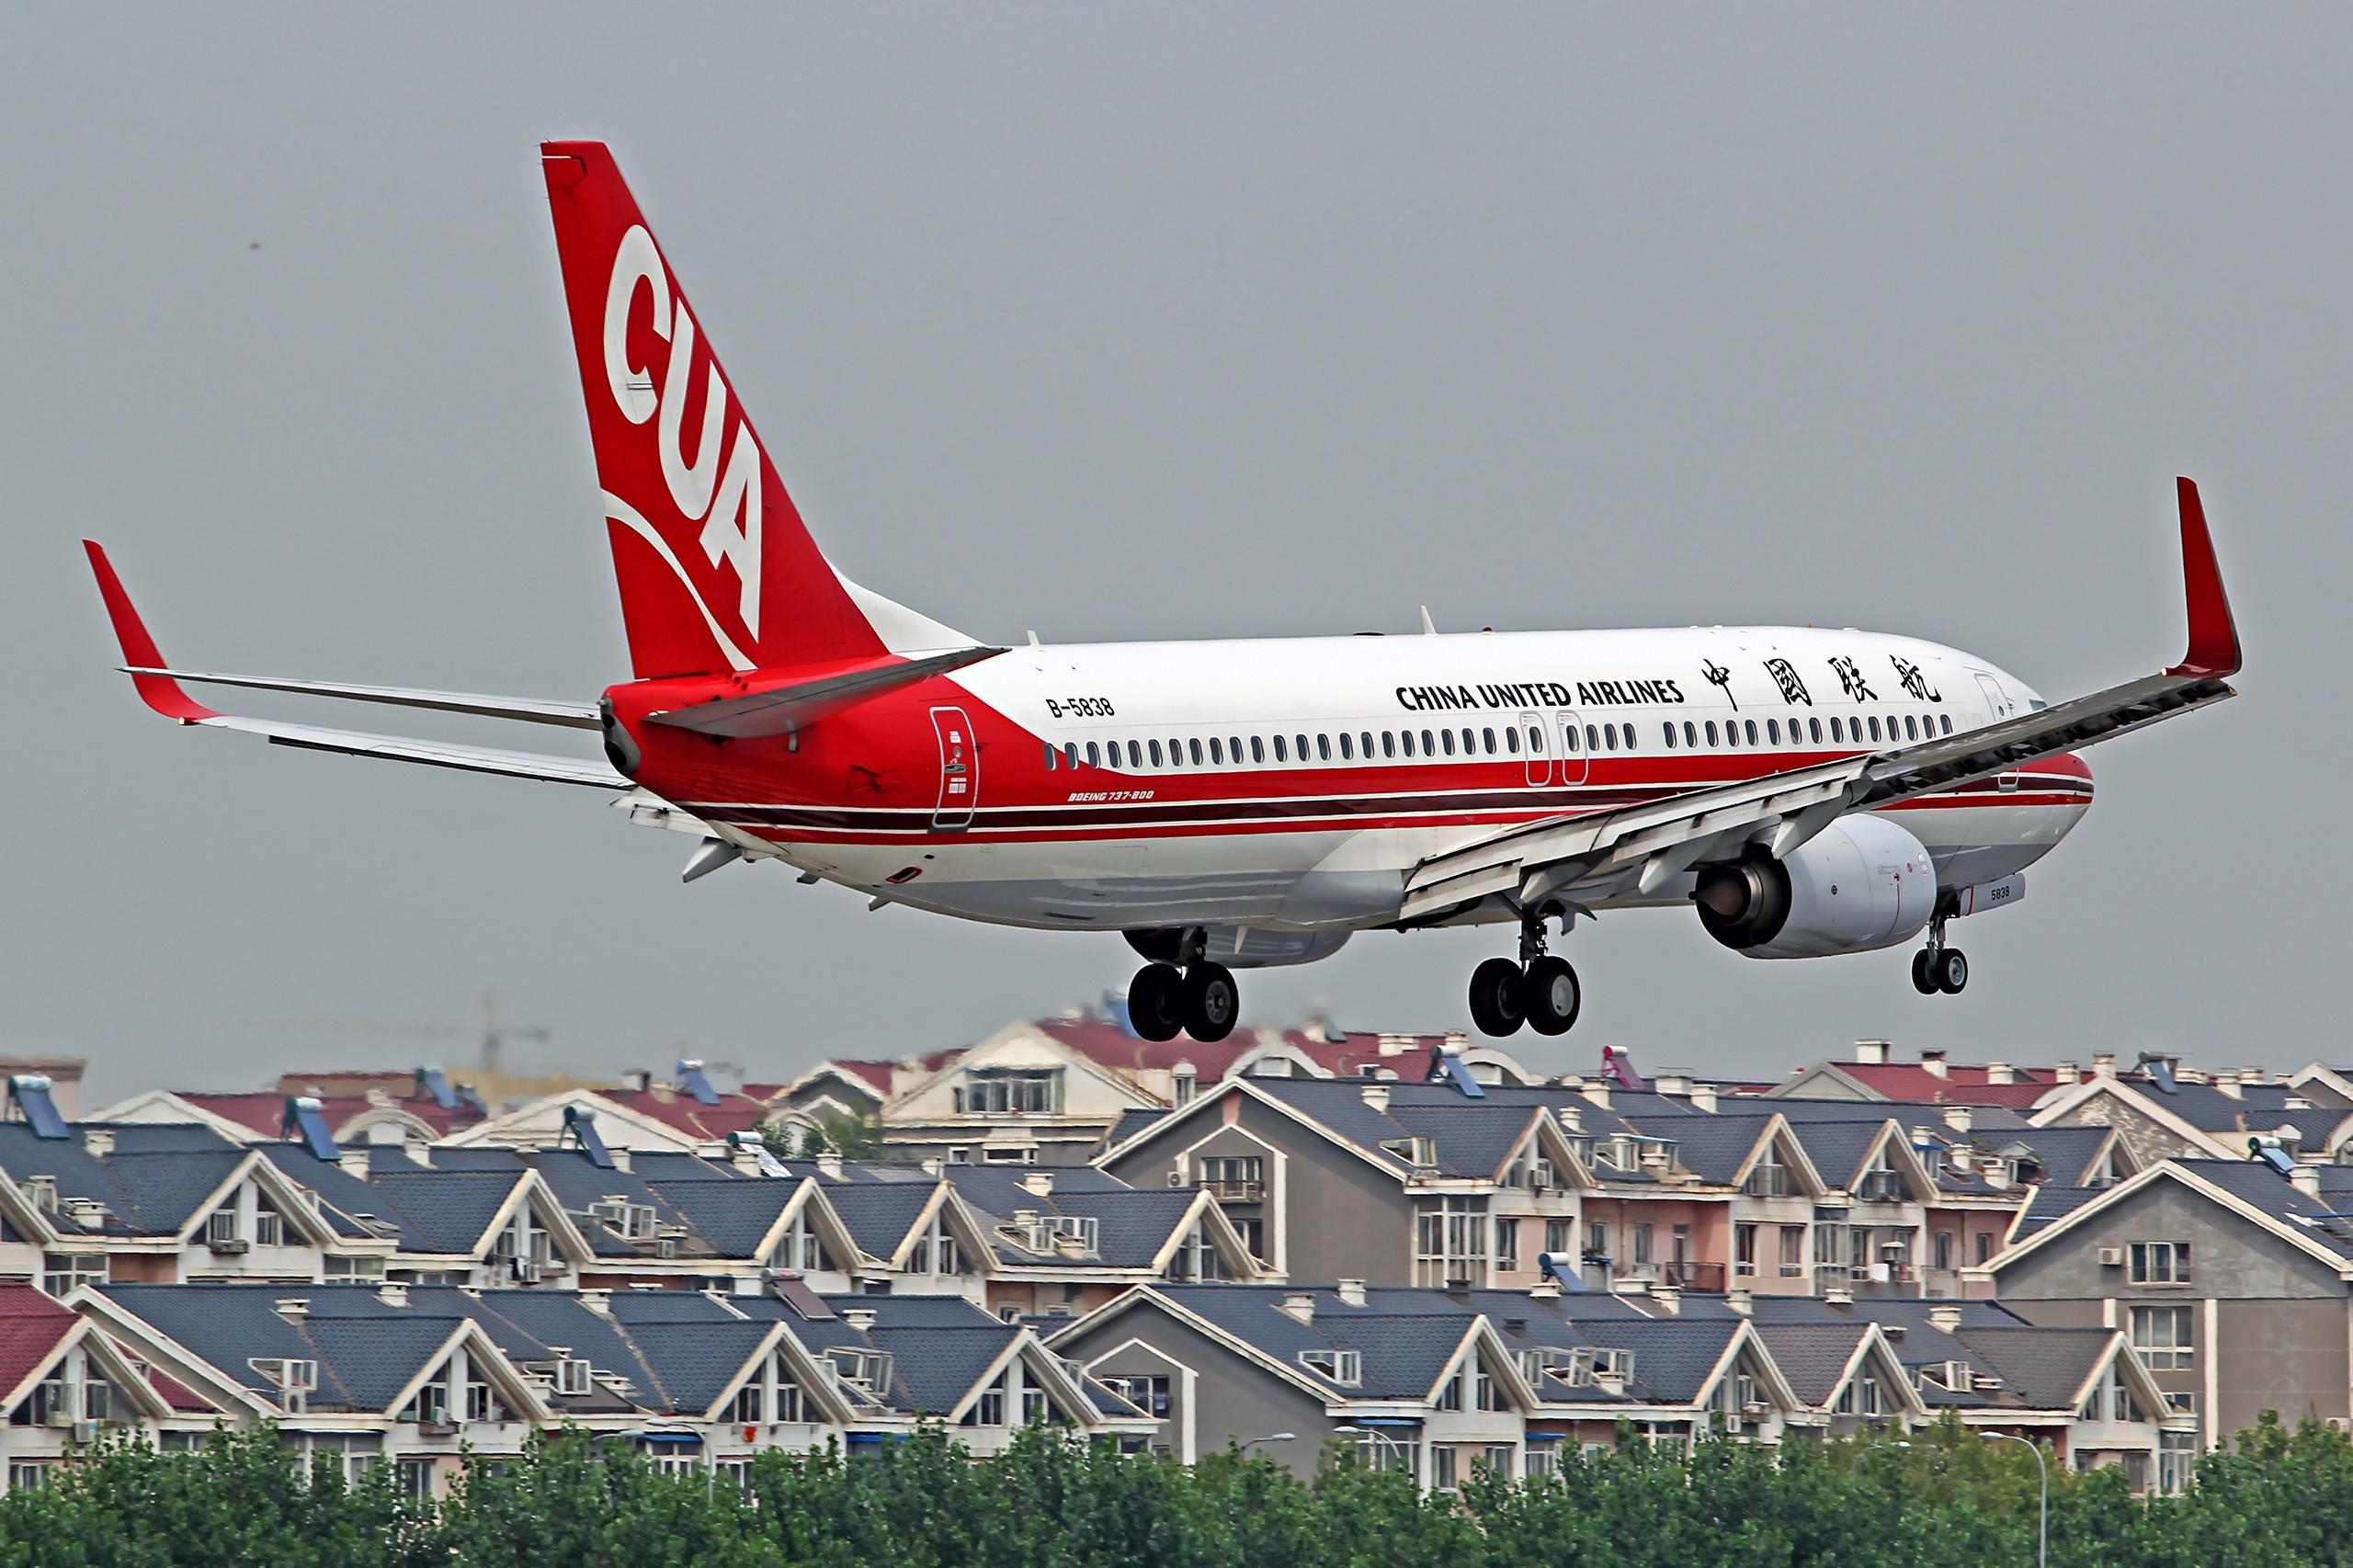 Re:[原创][DLC]...窄体机...2560x1707}Pix BOEING 737-800 B-5838 中国大连周水子国际机场